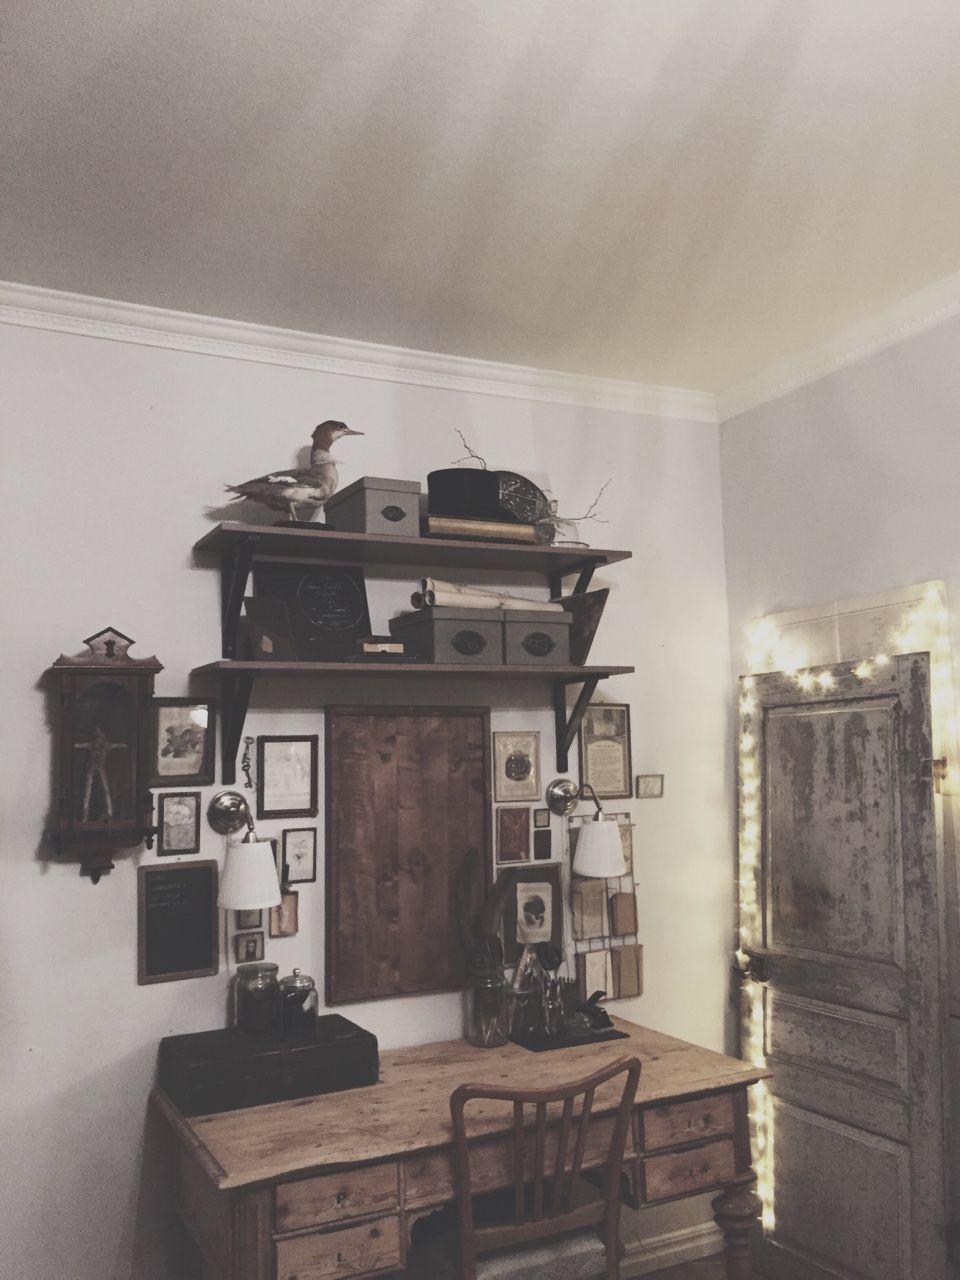 mostlythemarsh | Tumblr